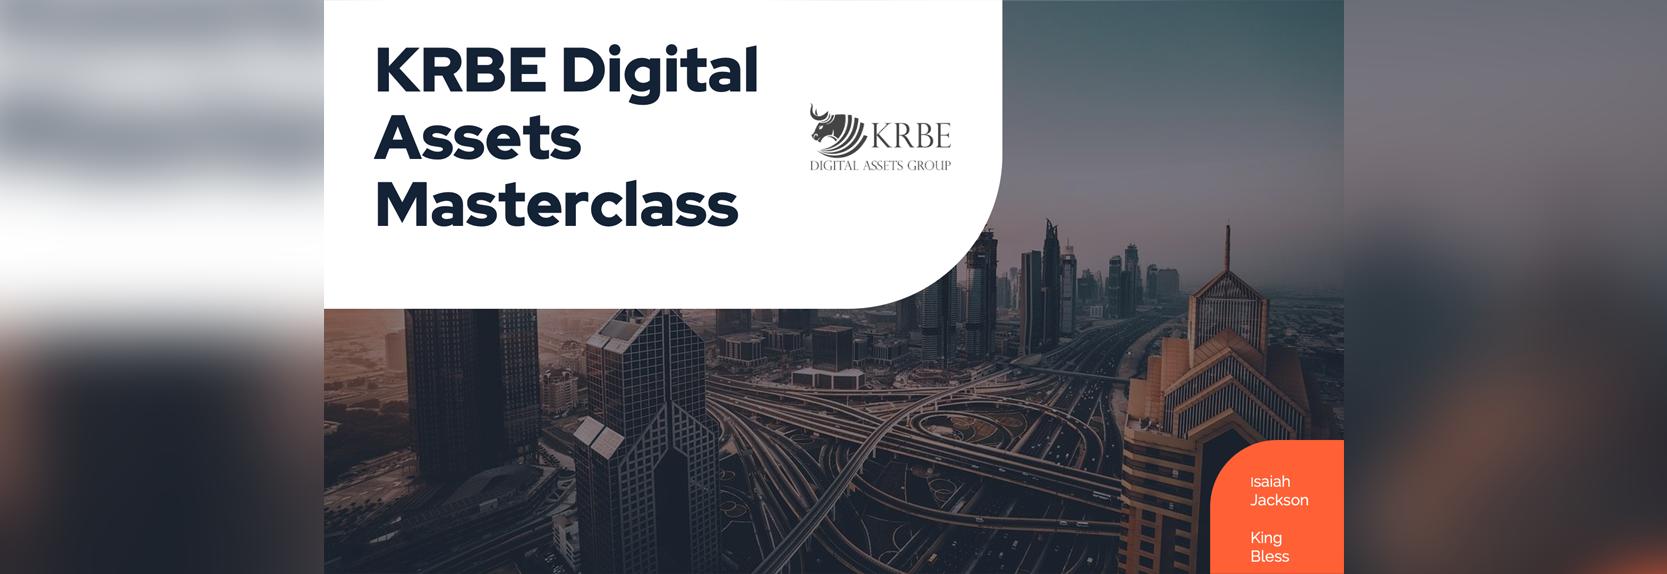 KRBE digital assets masterclass